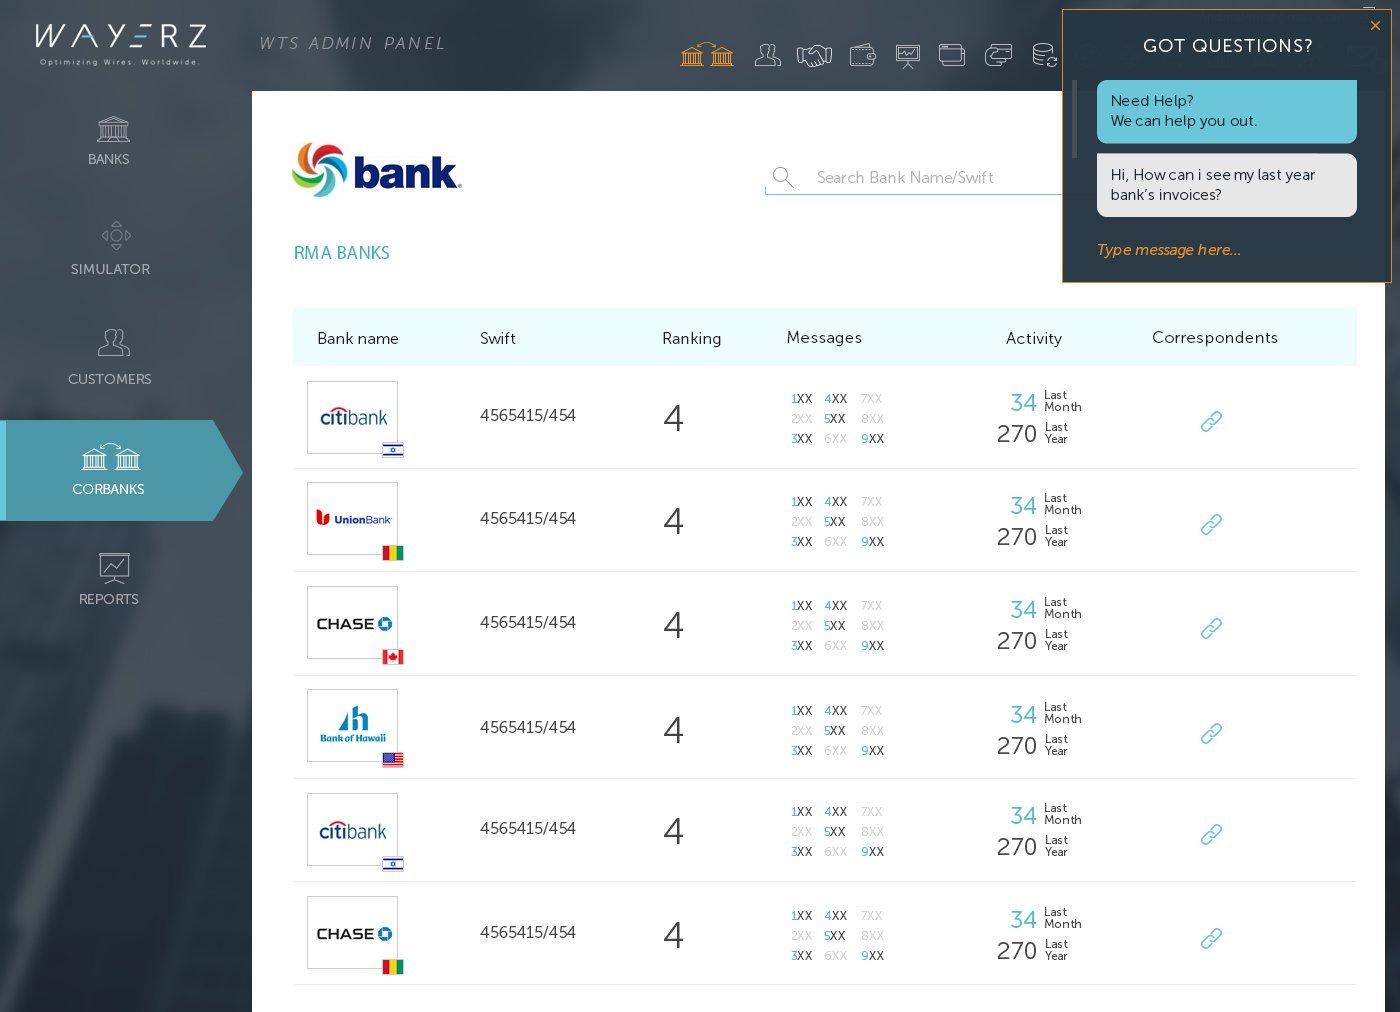 wayerz cisco bank platform